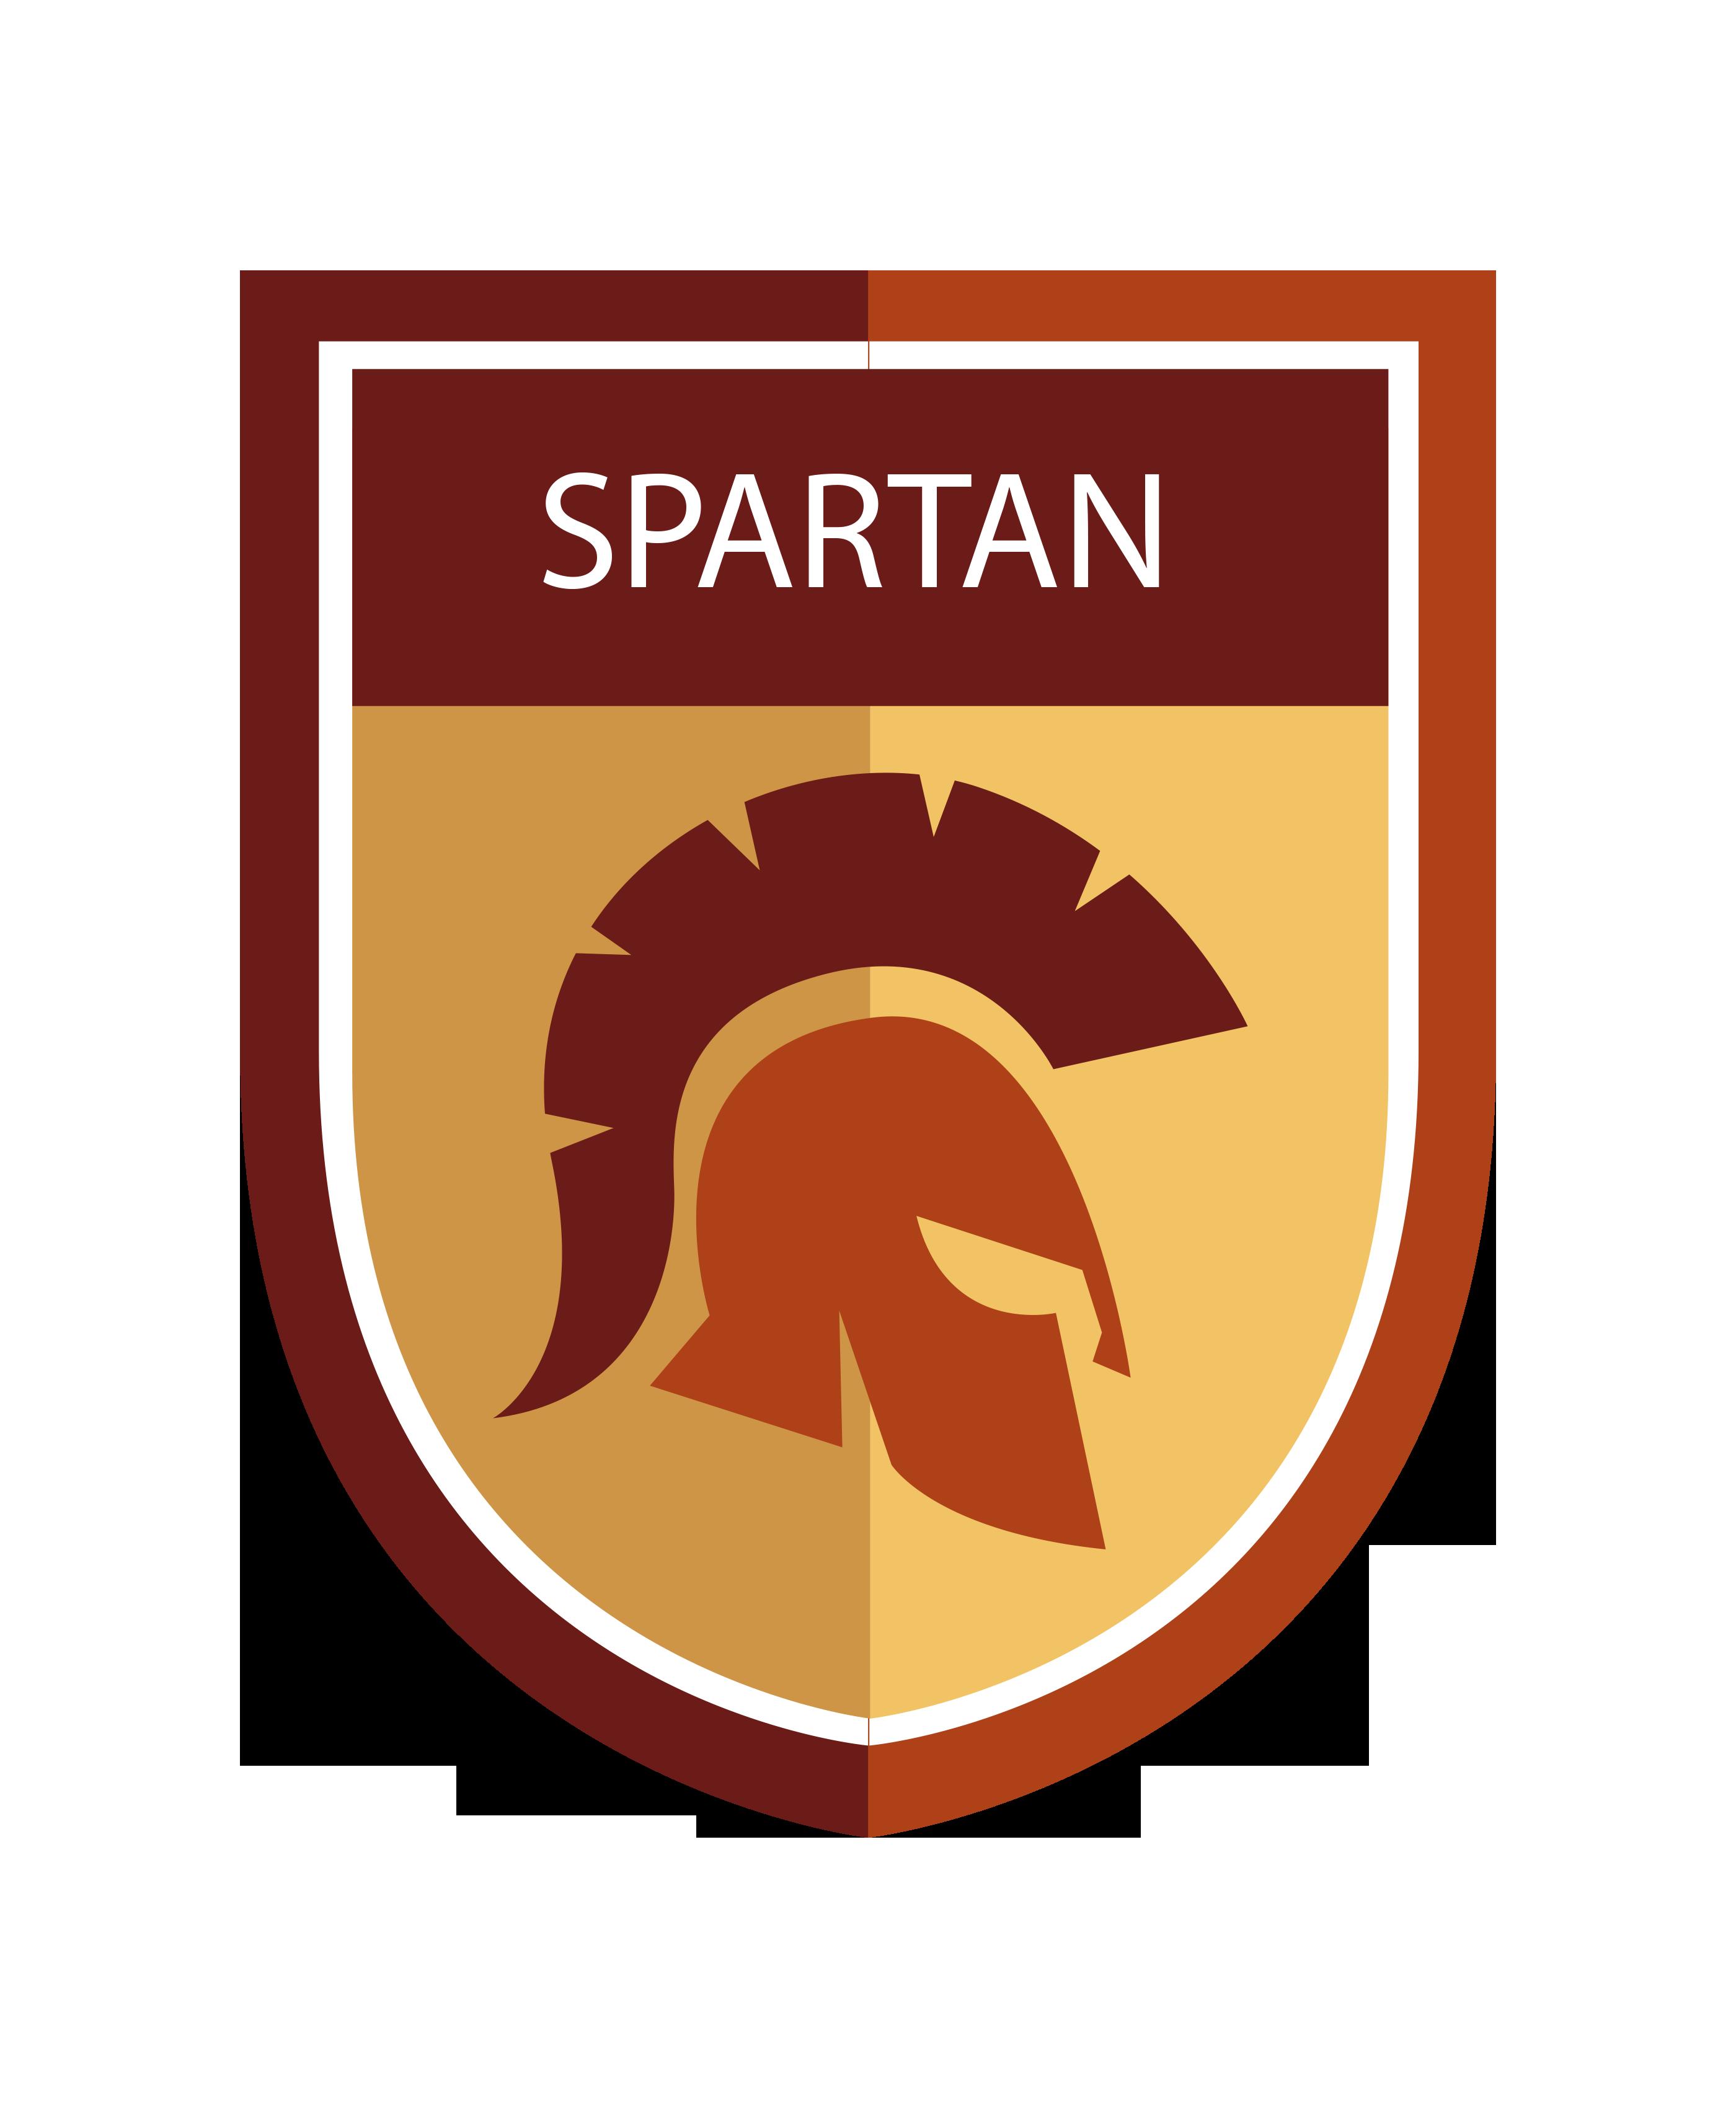 spartan shield in 2020 Spartan shield, Spartan, Shield